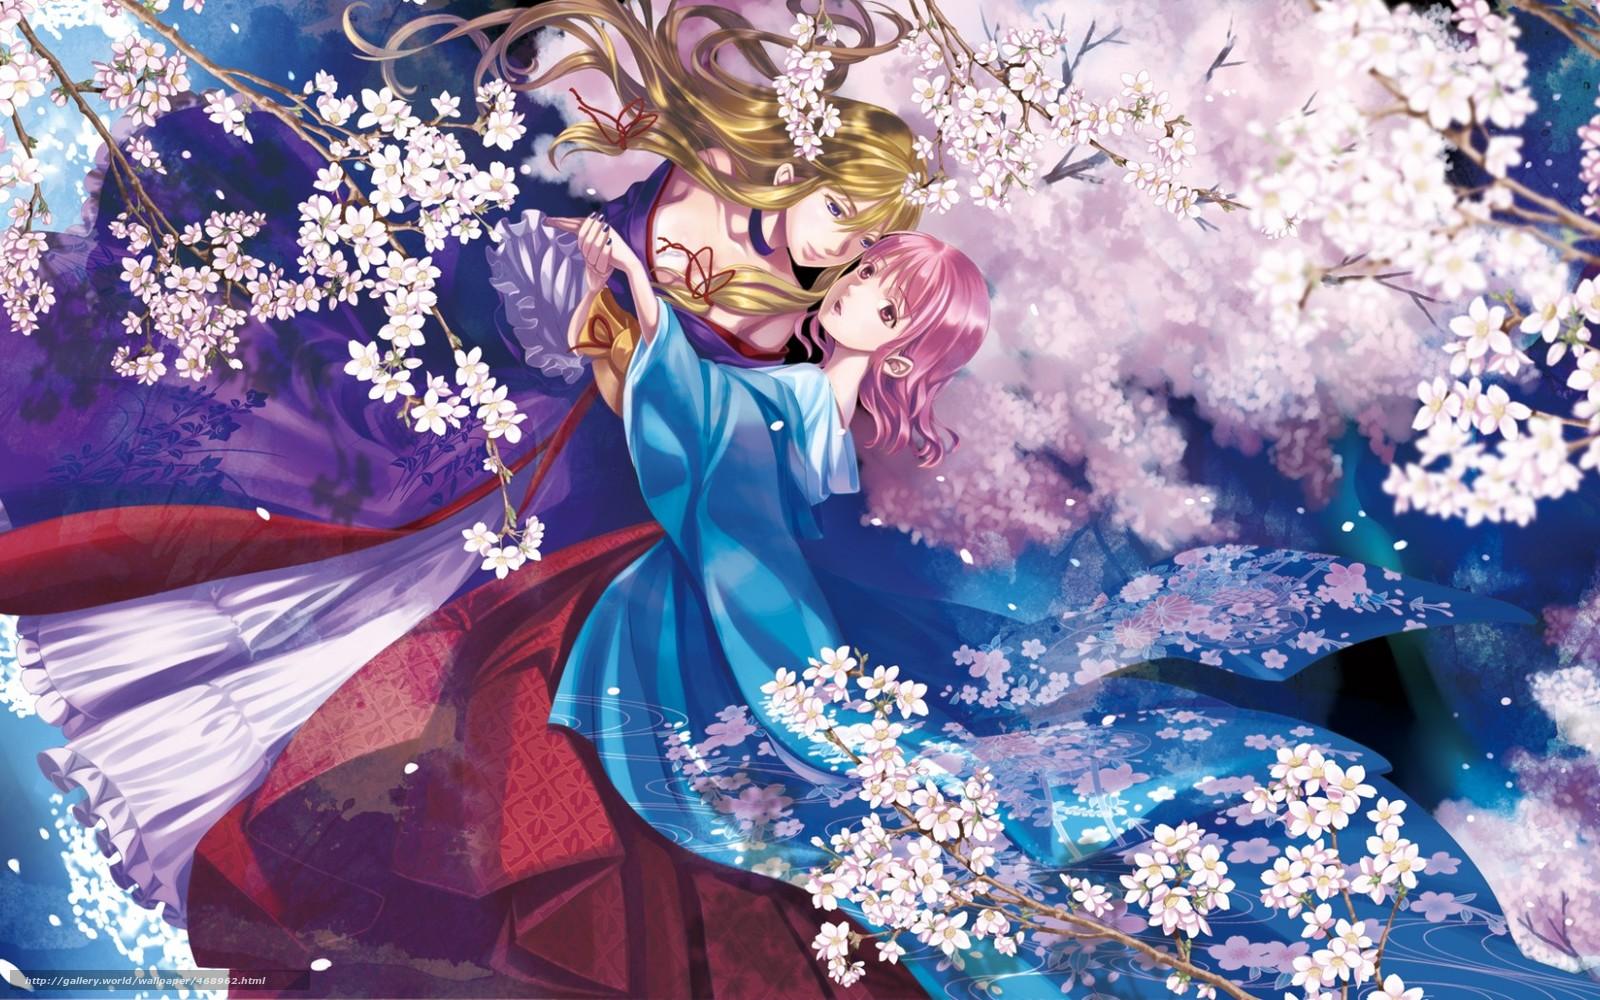 sakura wallpaper girls anime - photo #12